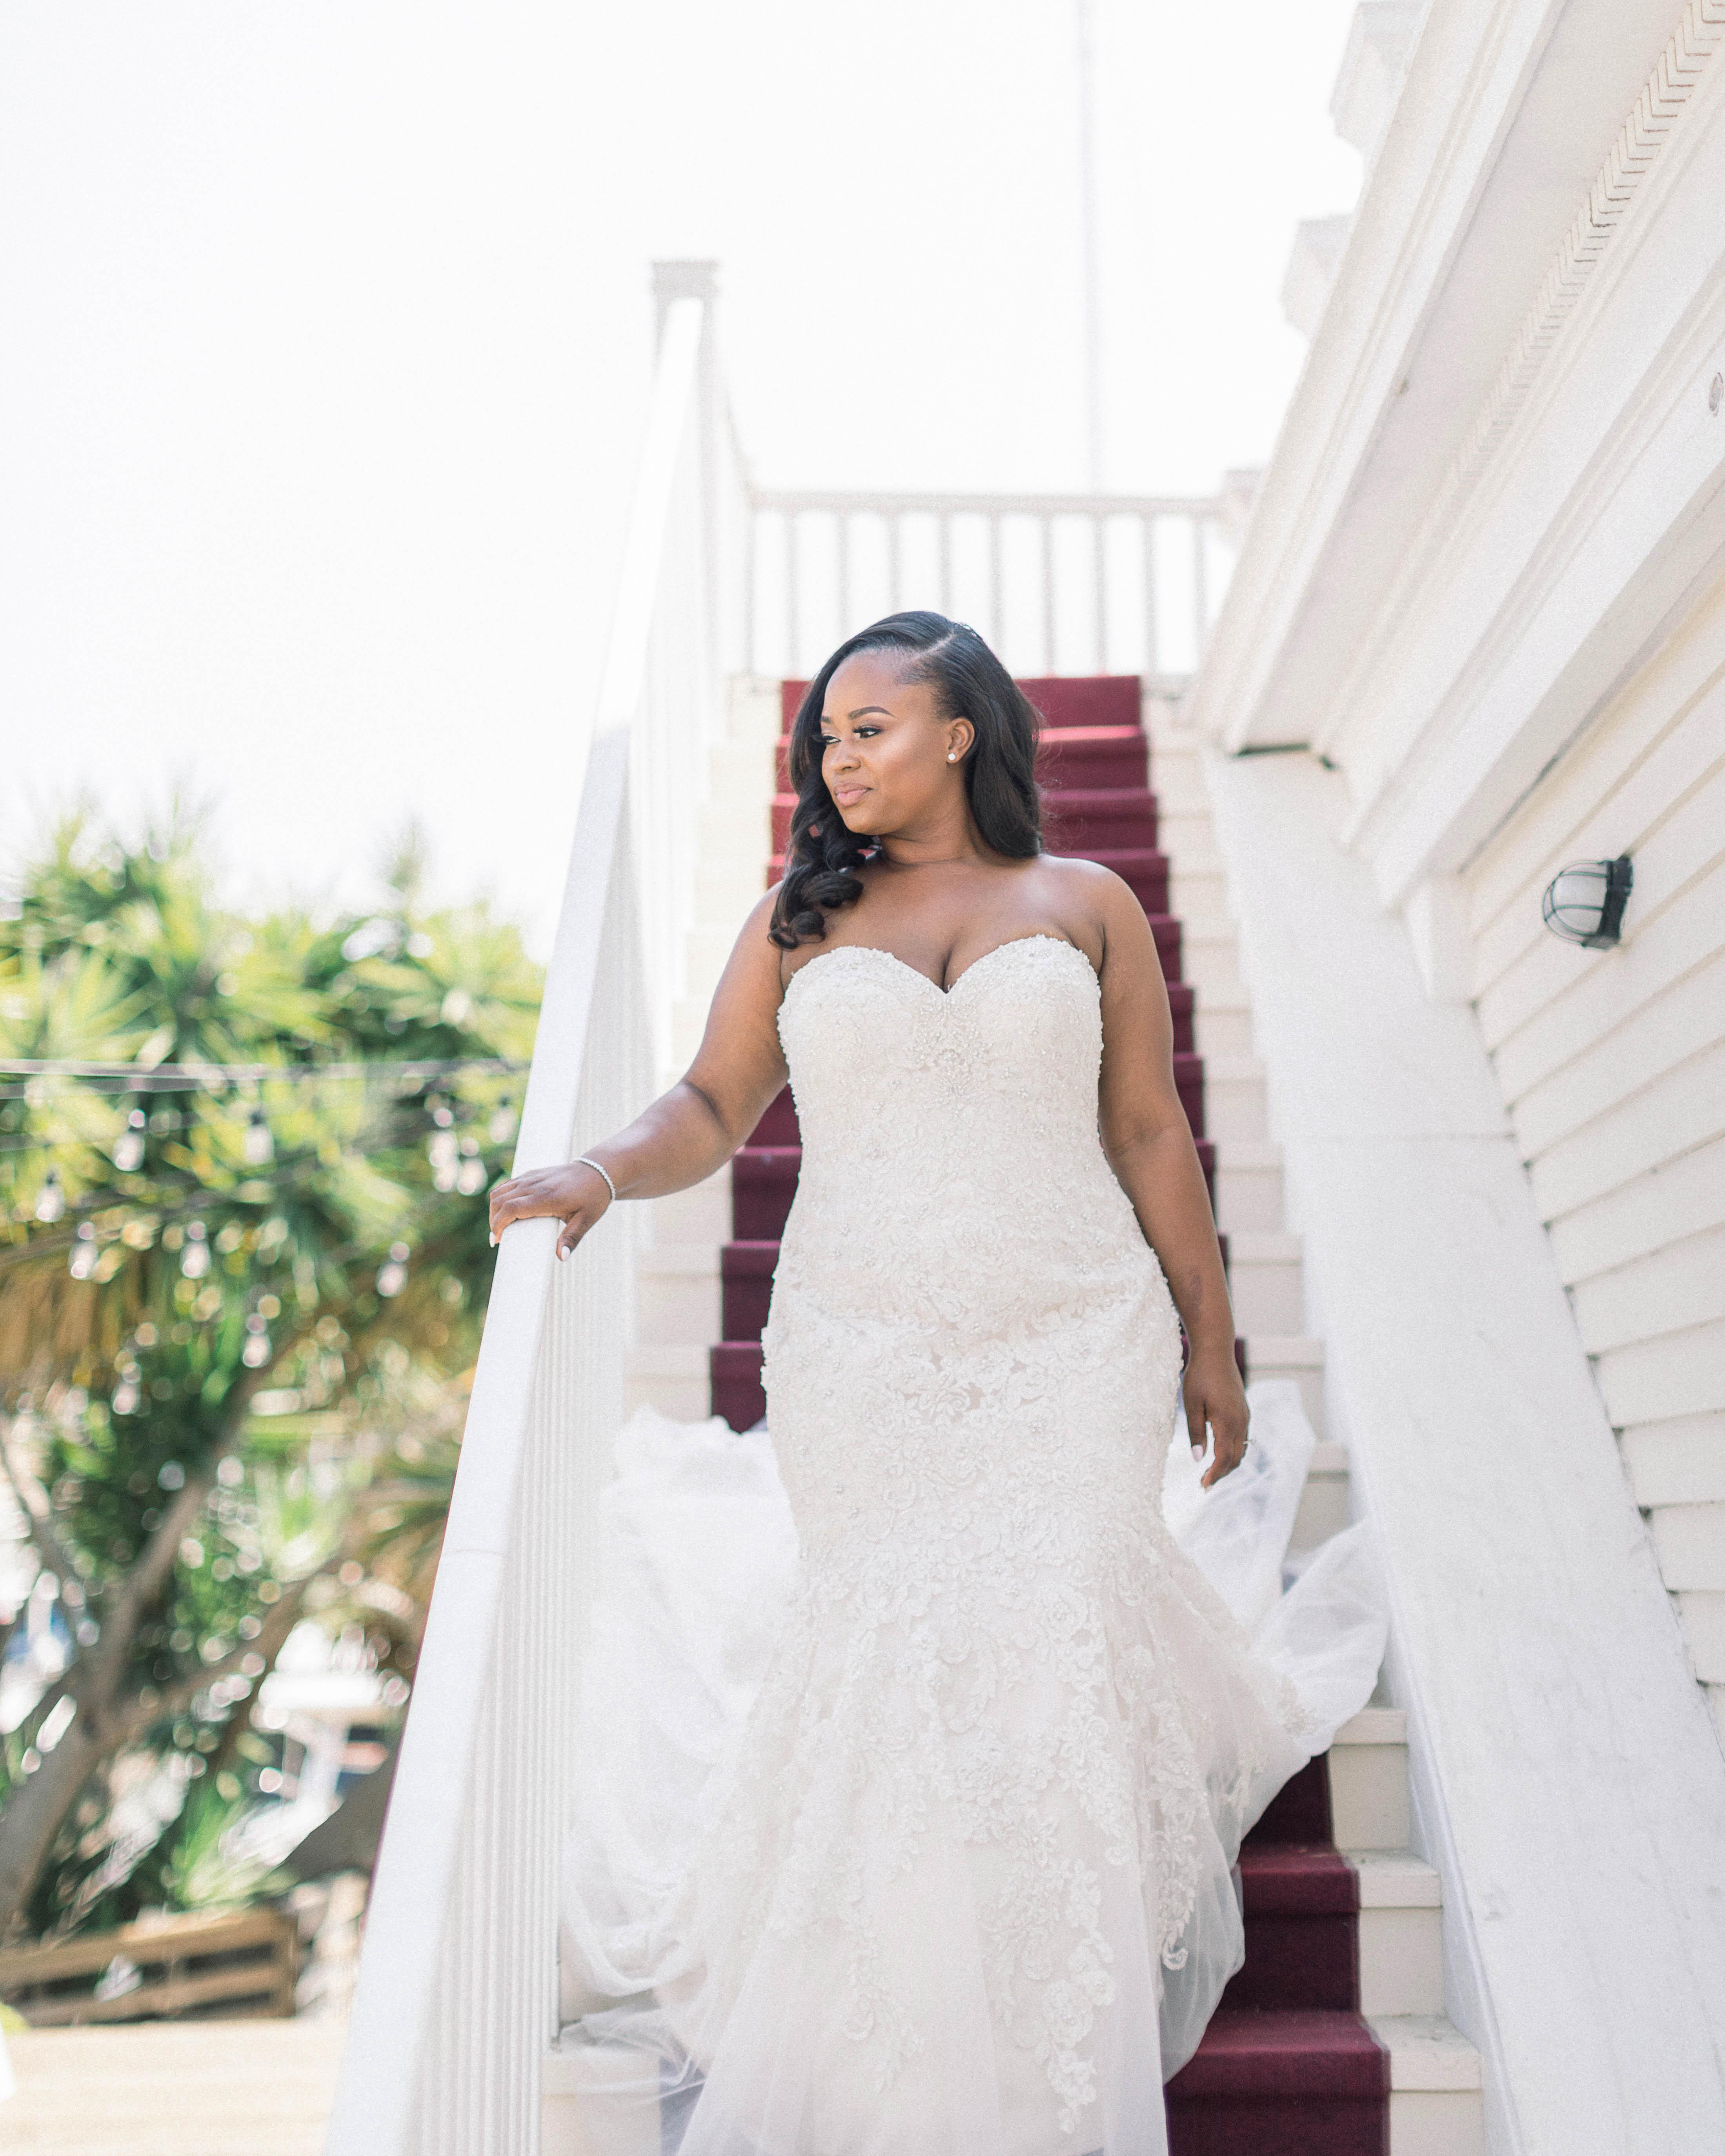 wedding bride stairway processional